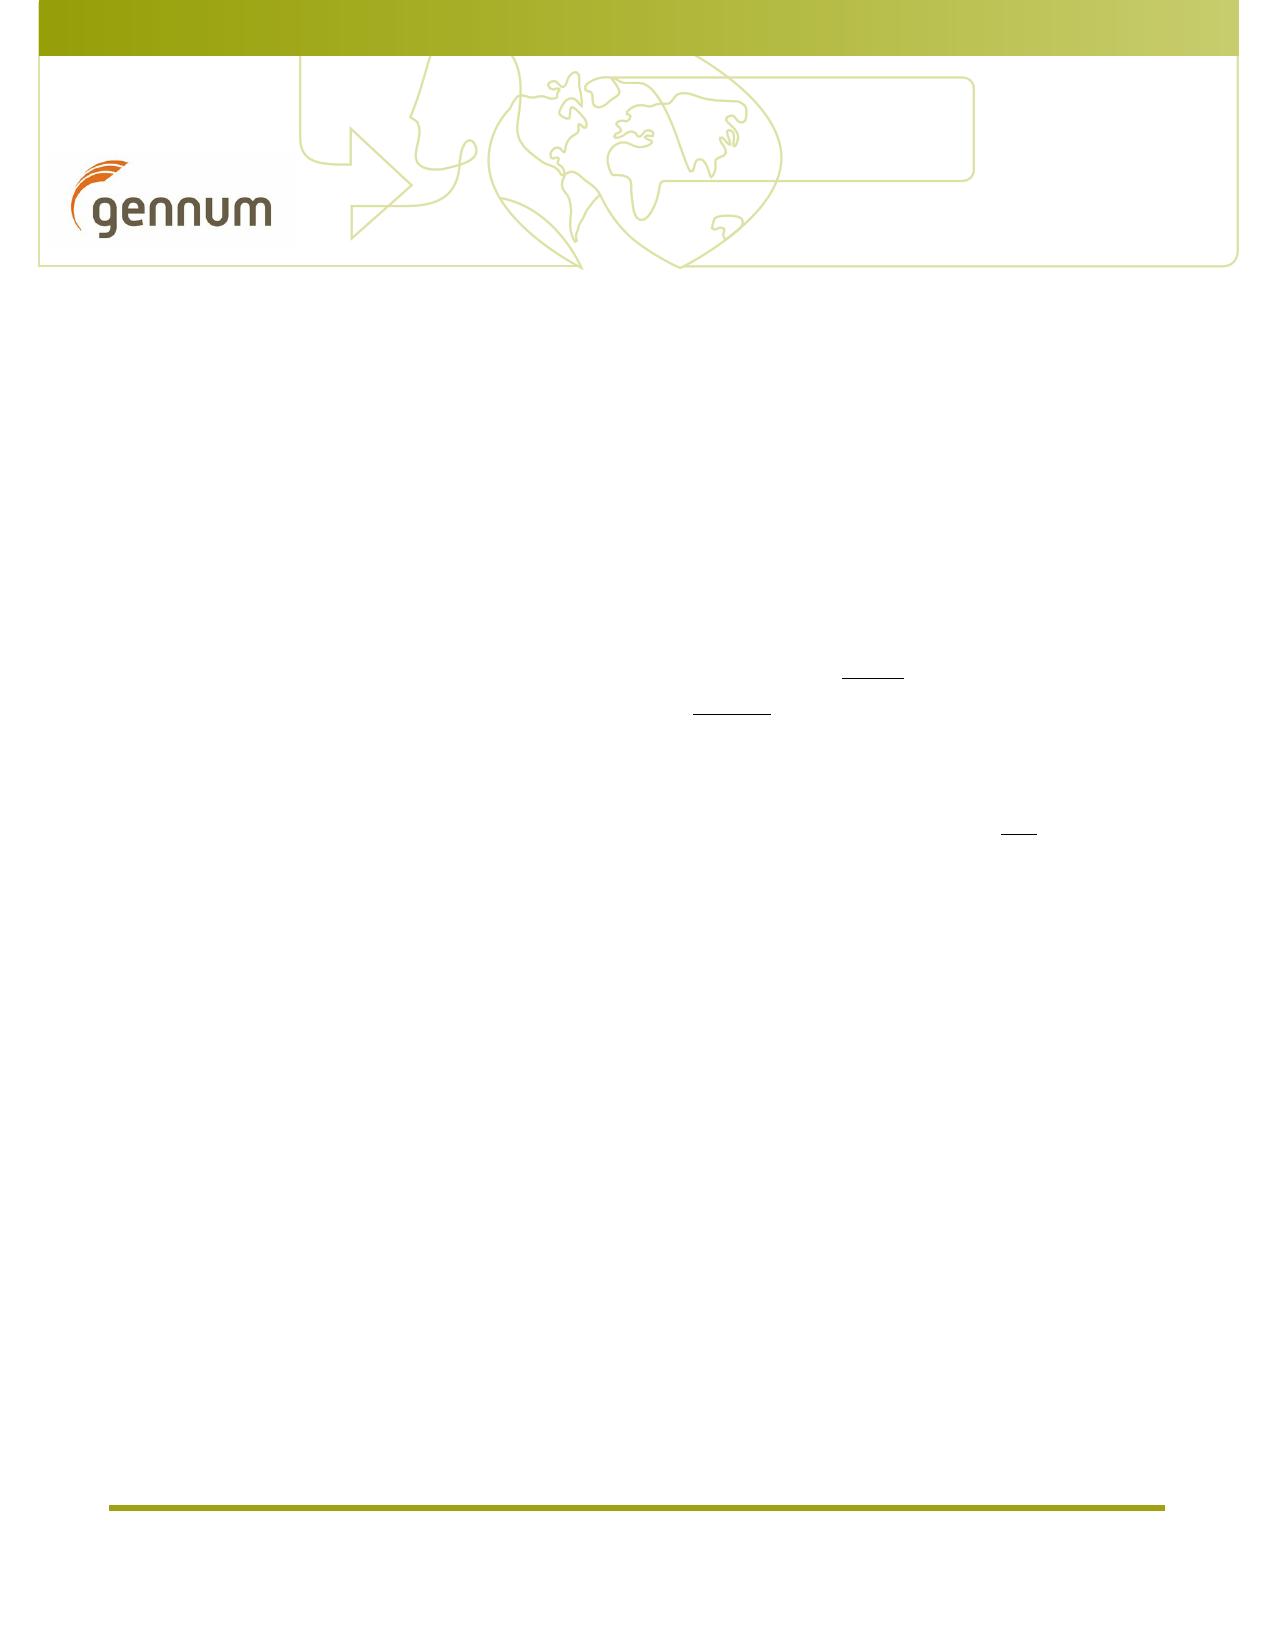 GS2988 datasheet